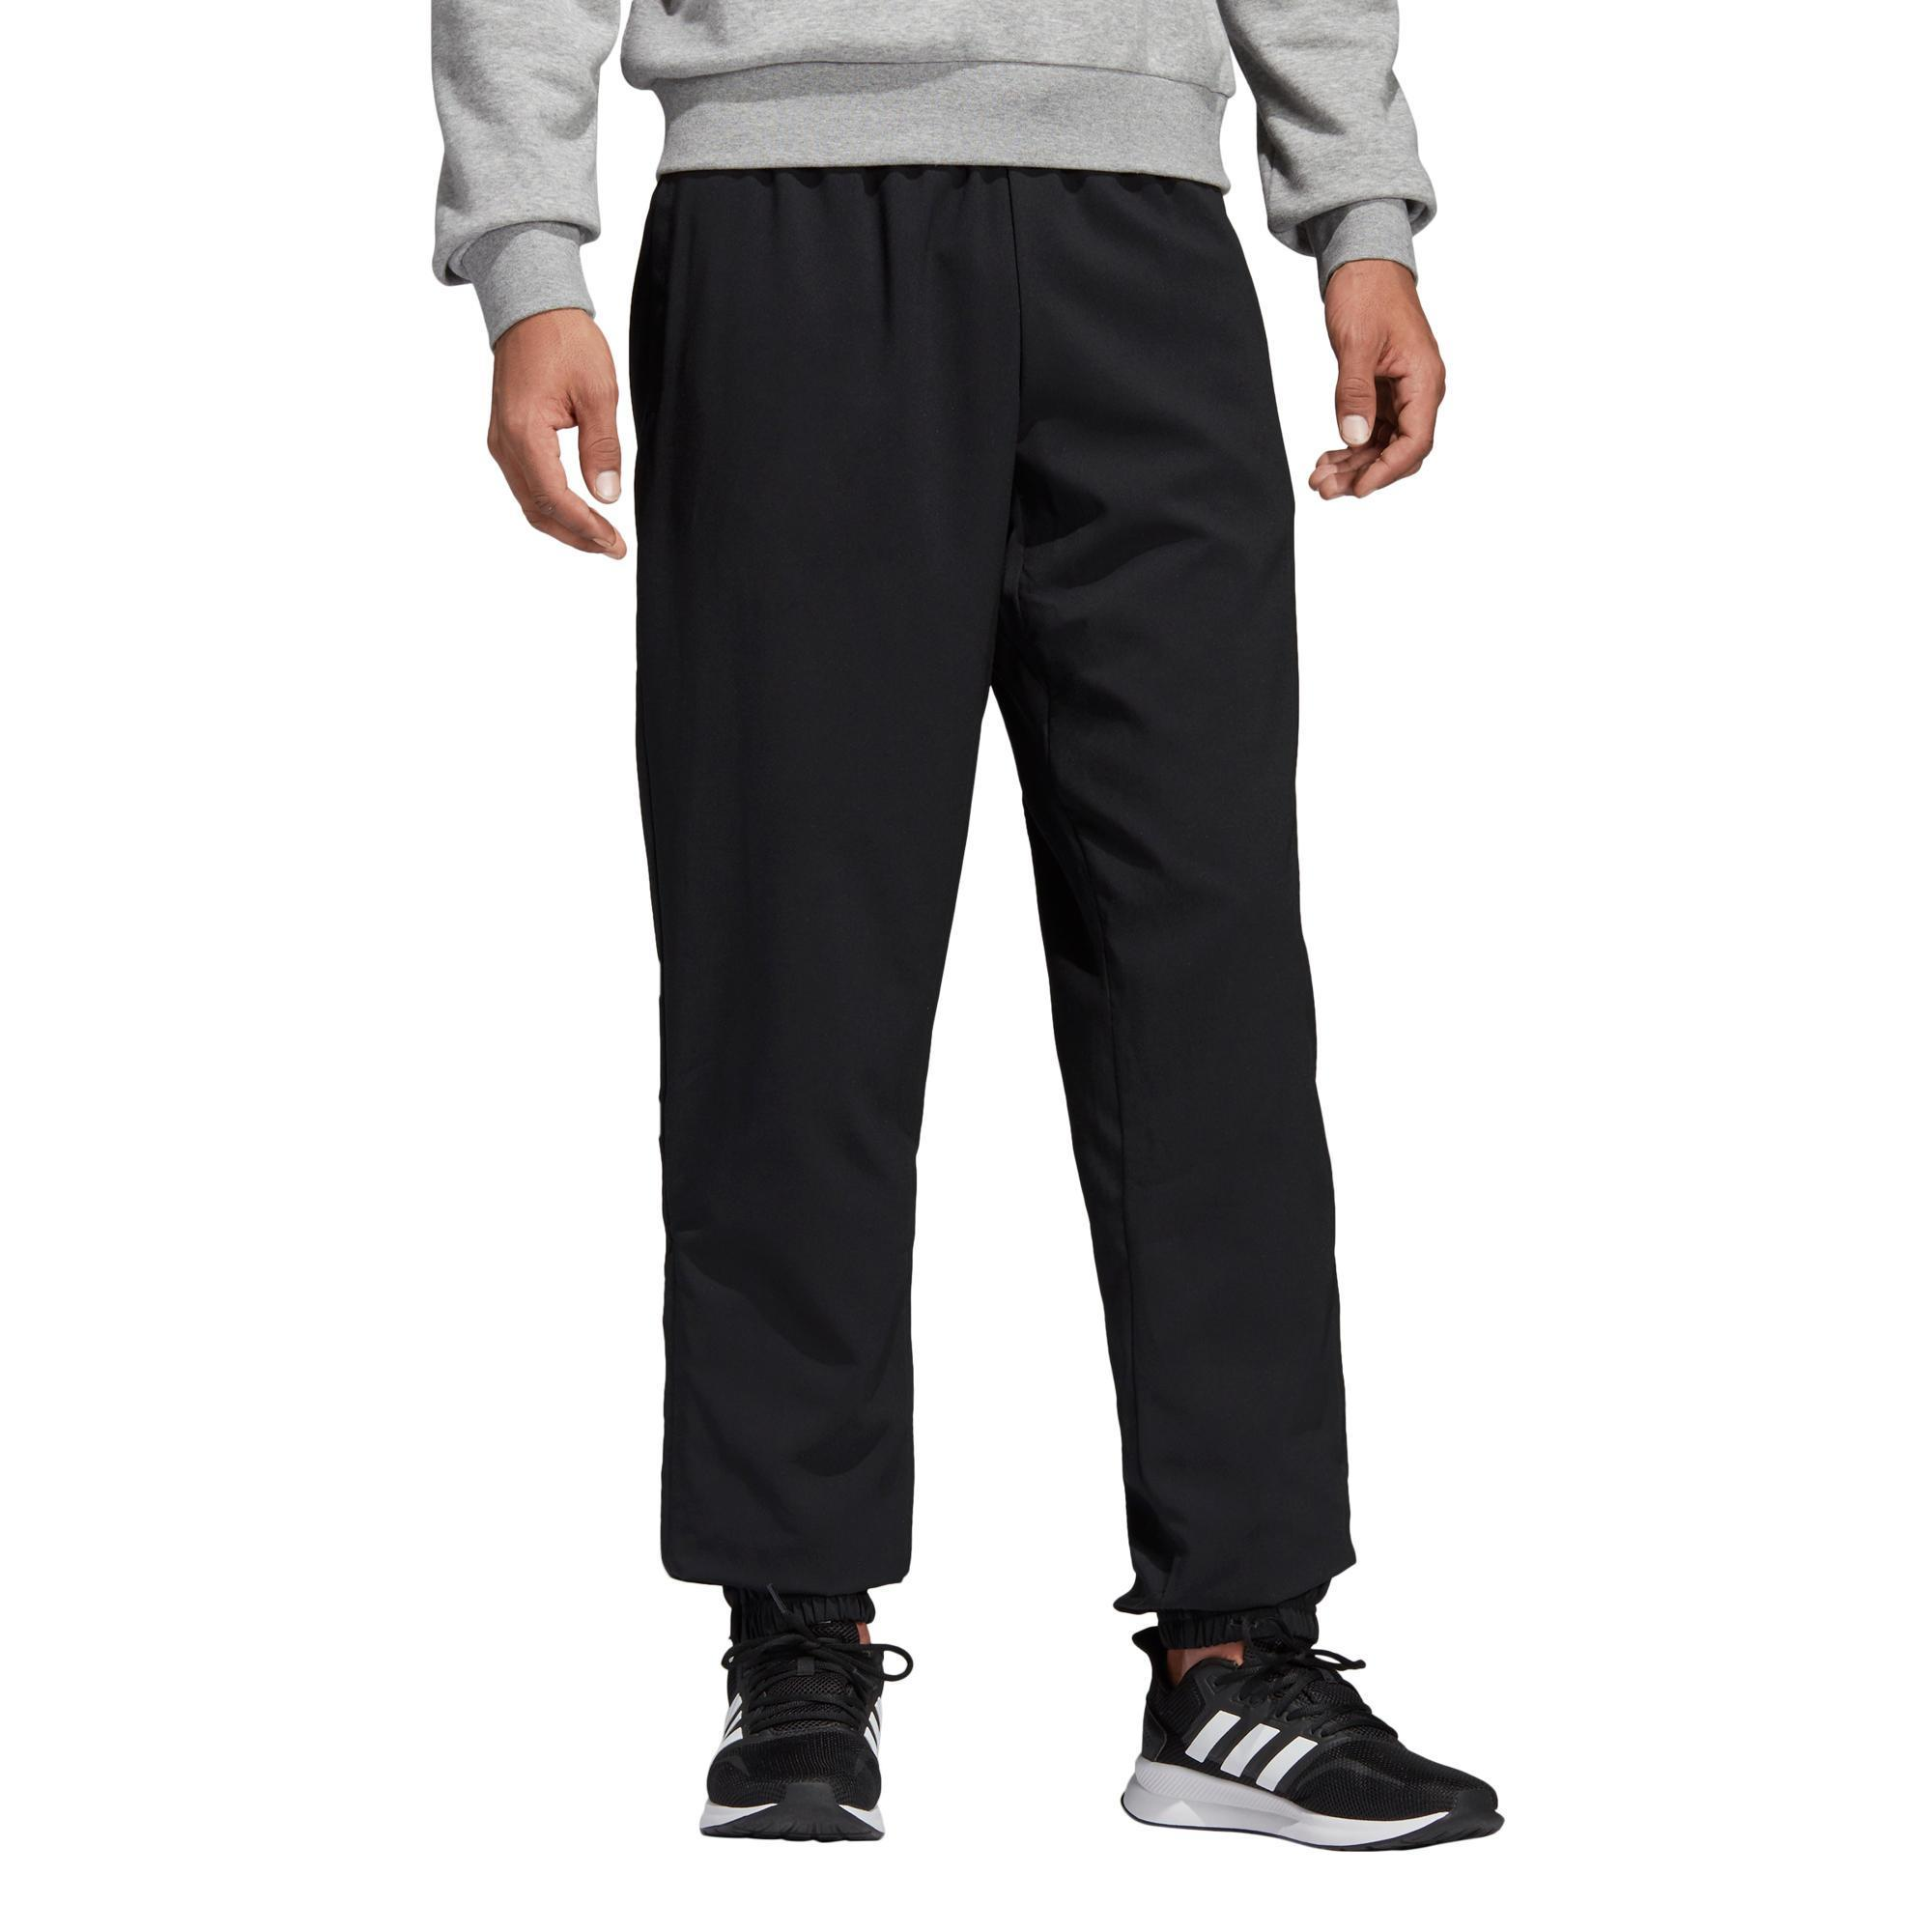 8e1e5184 Pantalones Adidas - Decathlon